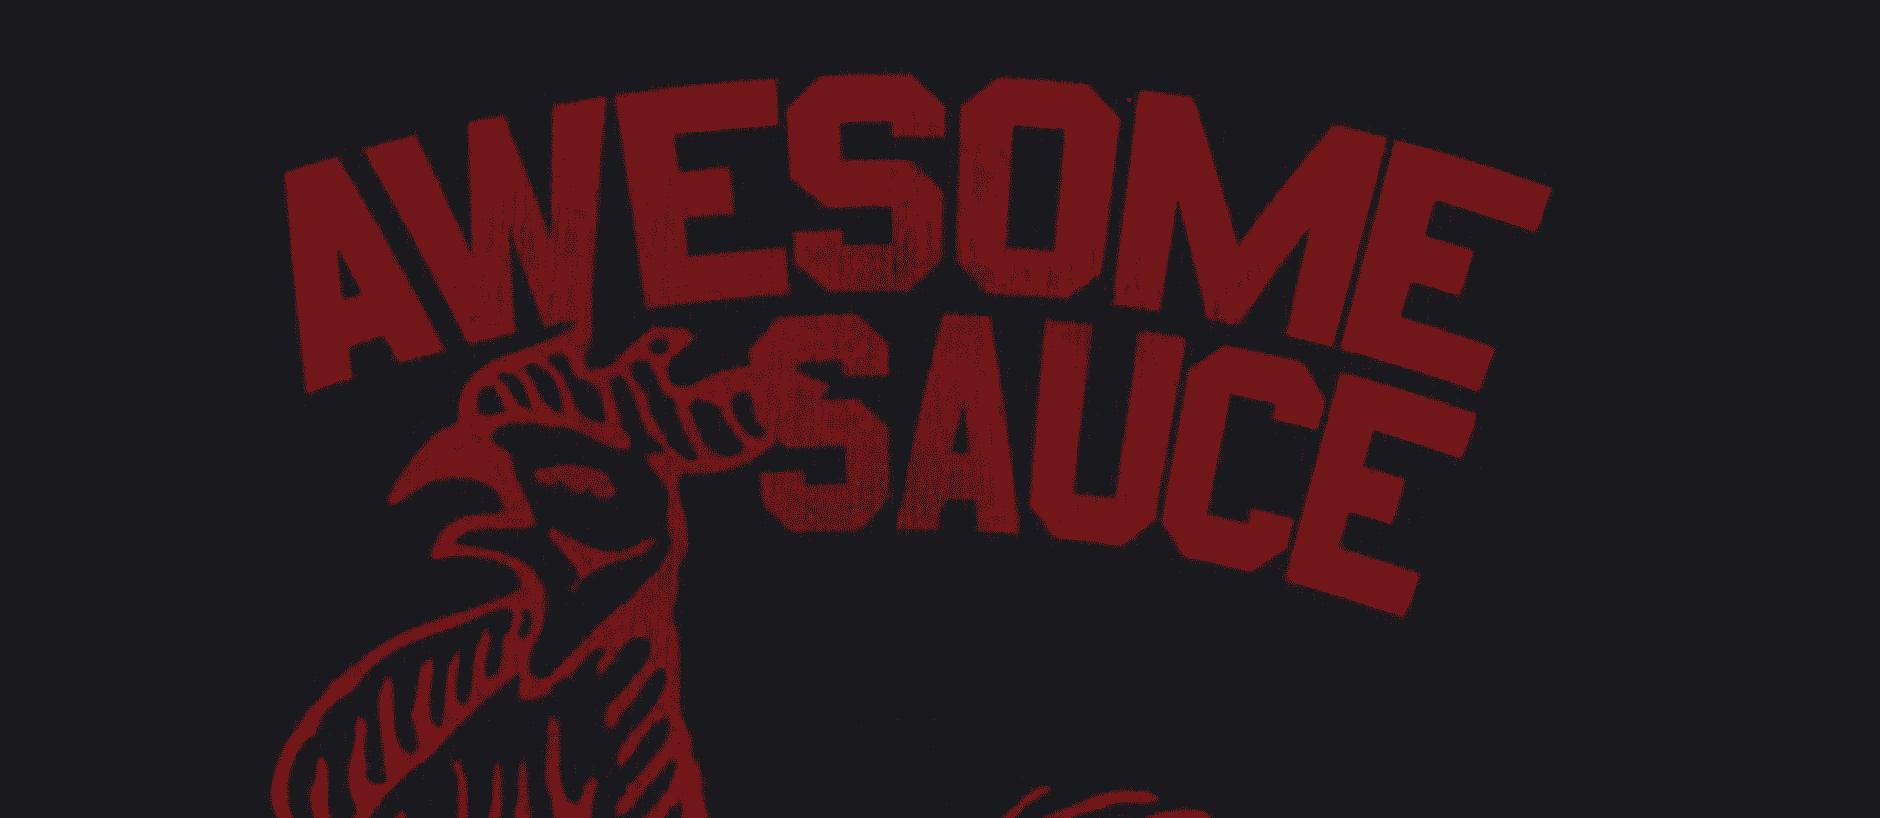 Top Sriracha Shirt Styles: Hot And Cool Meet